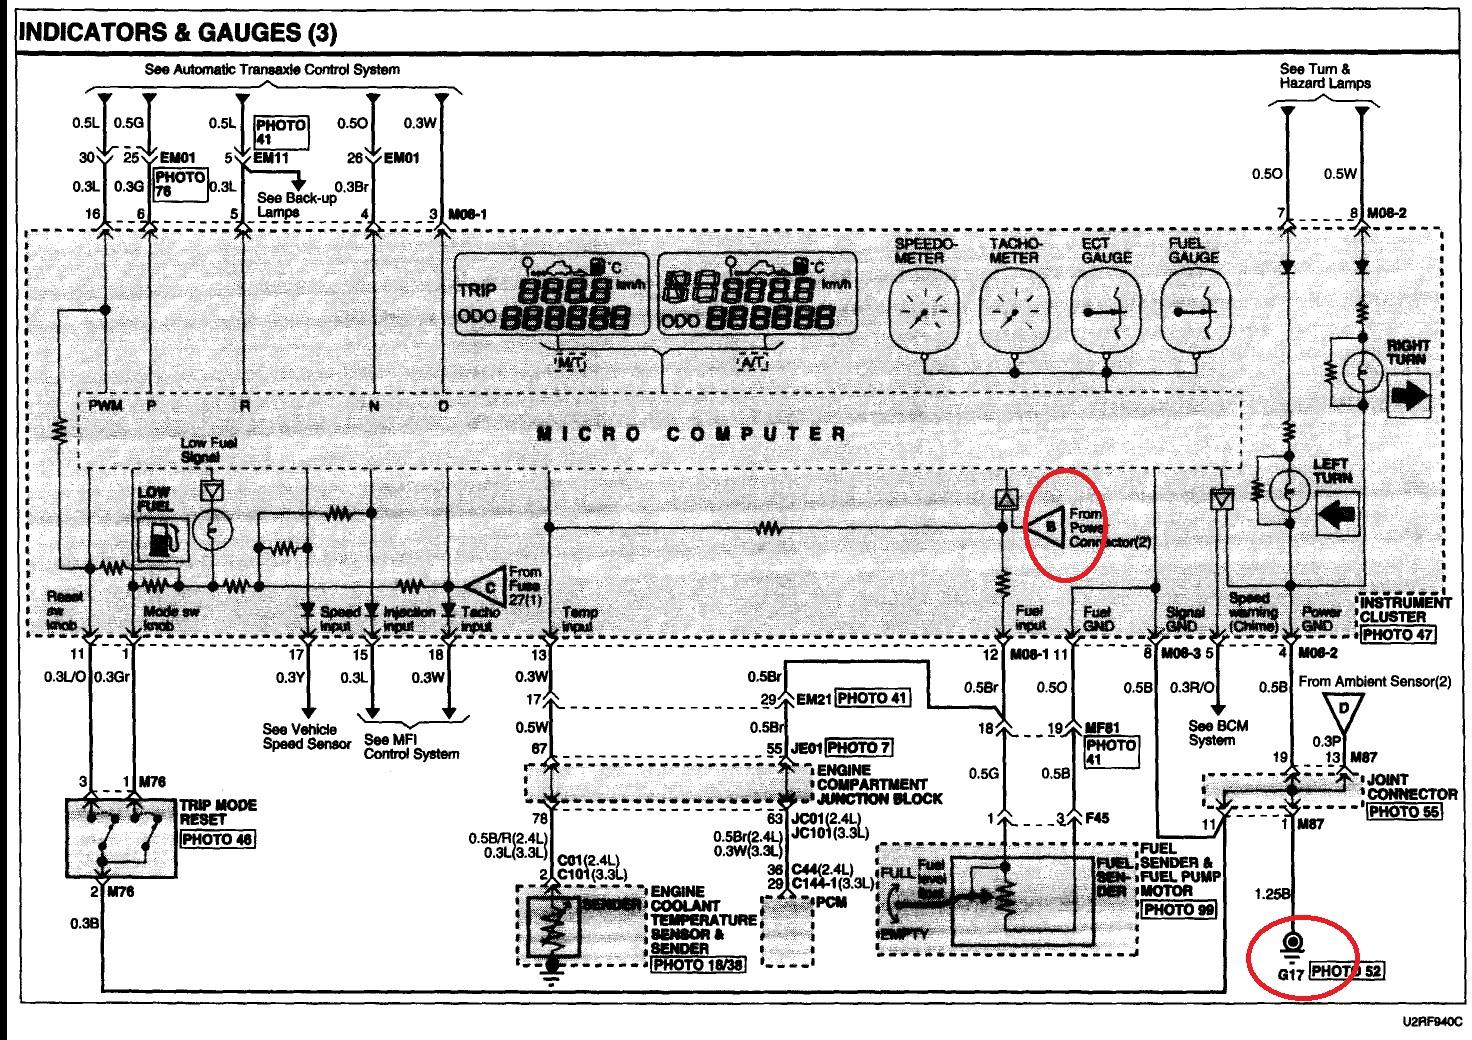 2009 Hyundai Accent Wiring Diagrams Wiring Diagram